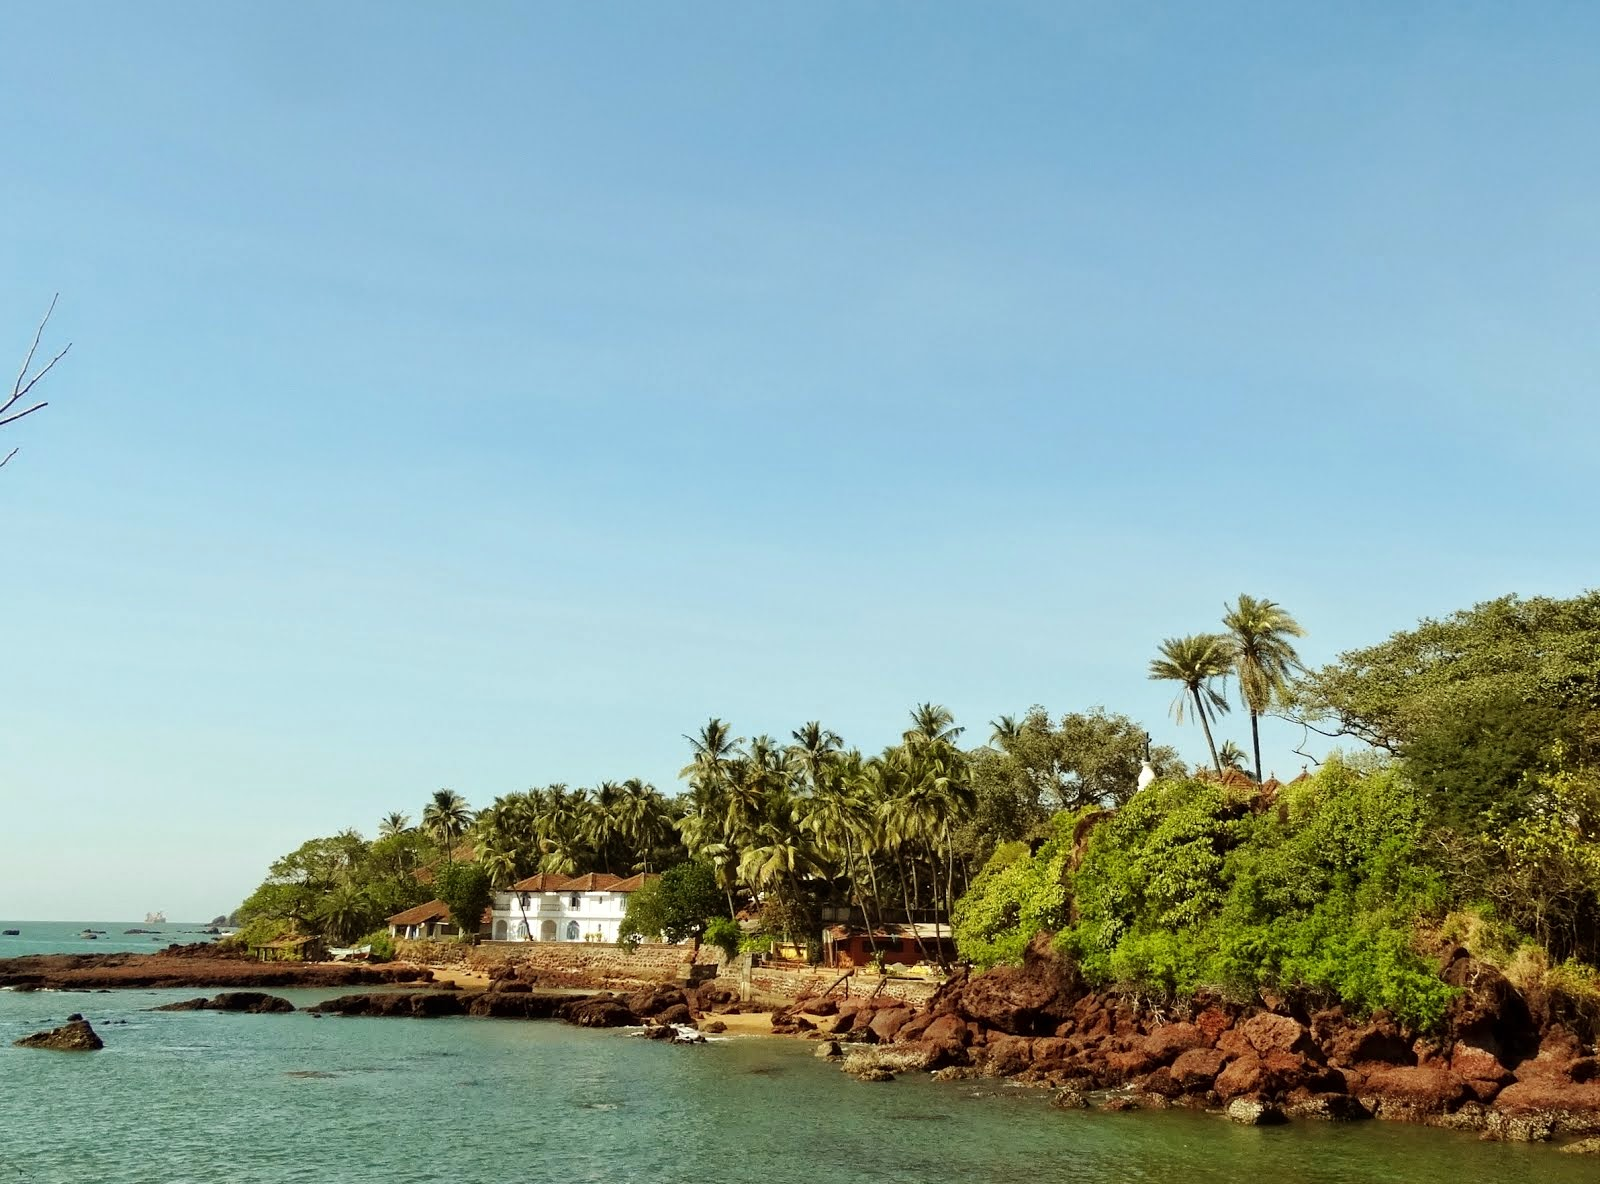 Penjab/Old Goa